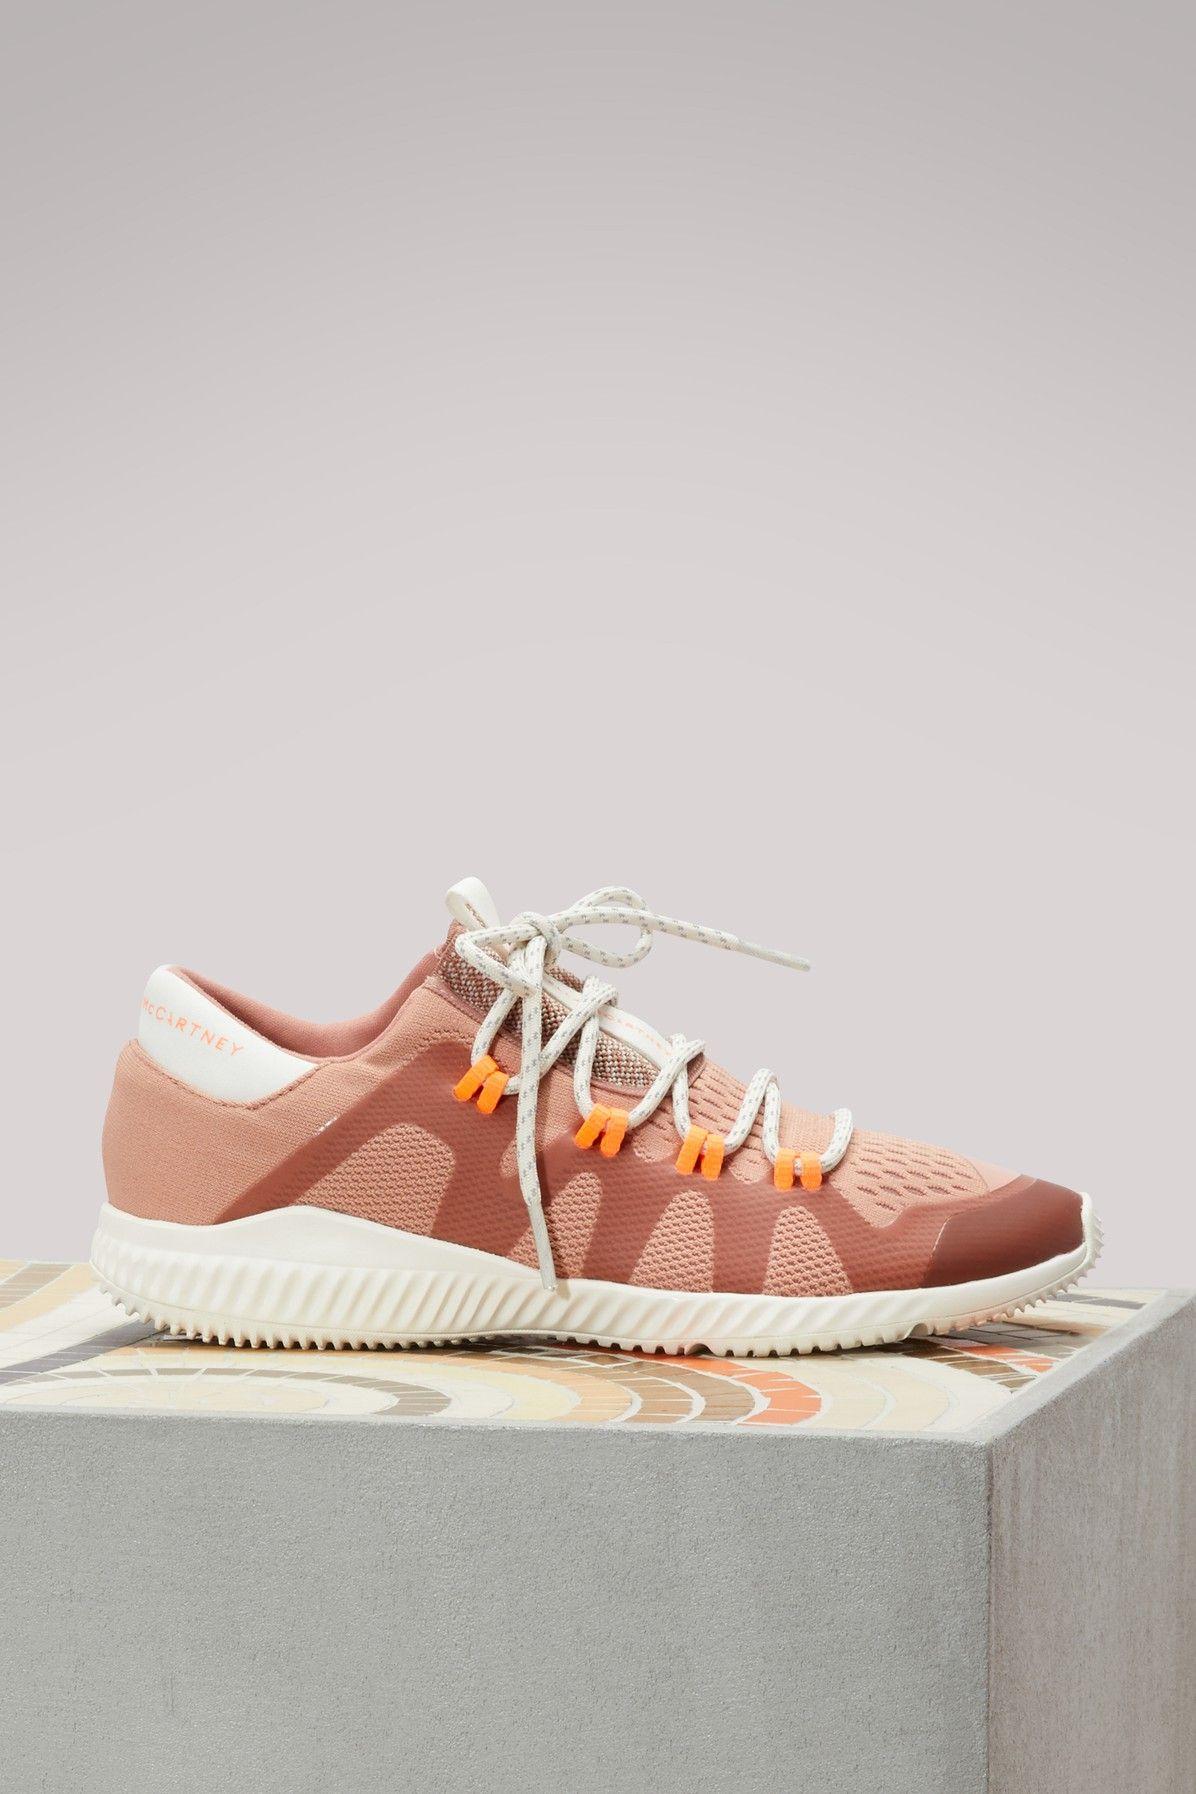 wholesale dealer b5097 66cde ADIDAS BY STELLA MCCARTNEY CRAZYTRAIN PRO SNEAKERS.   adidasbystellamccartney  shoes